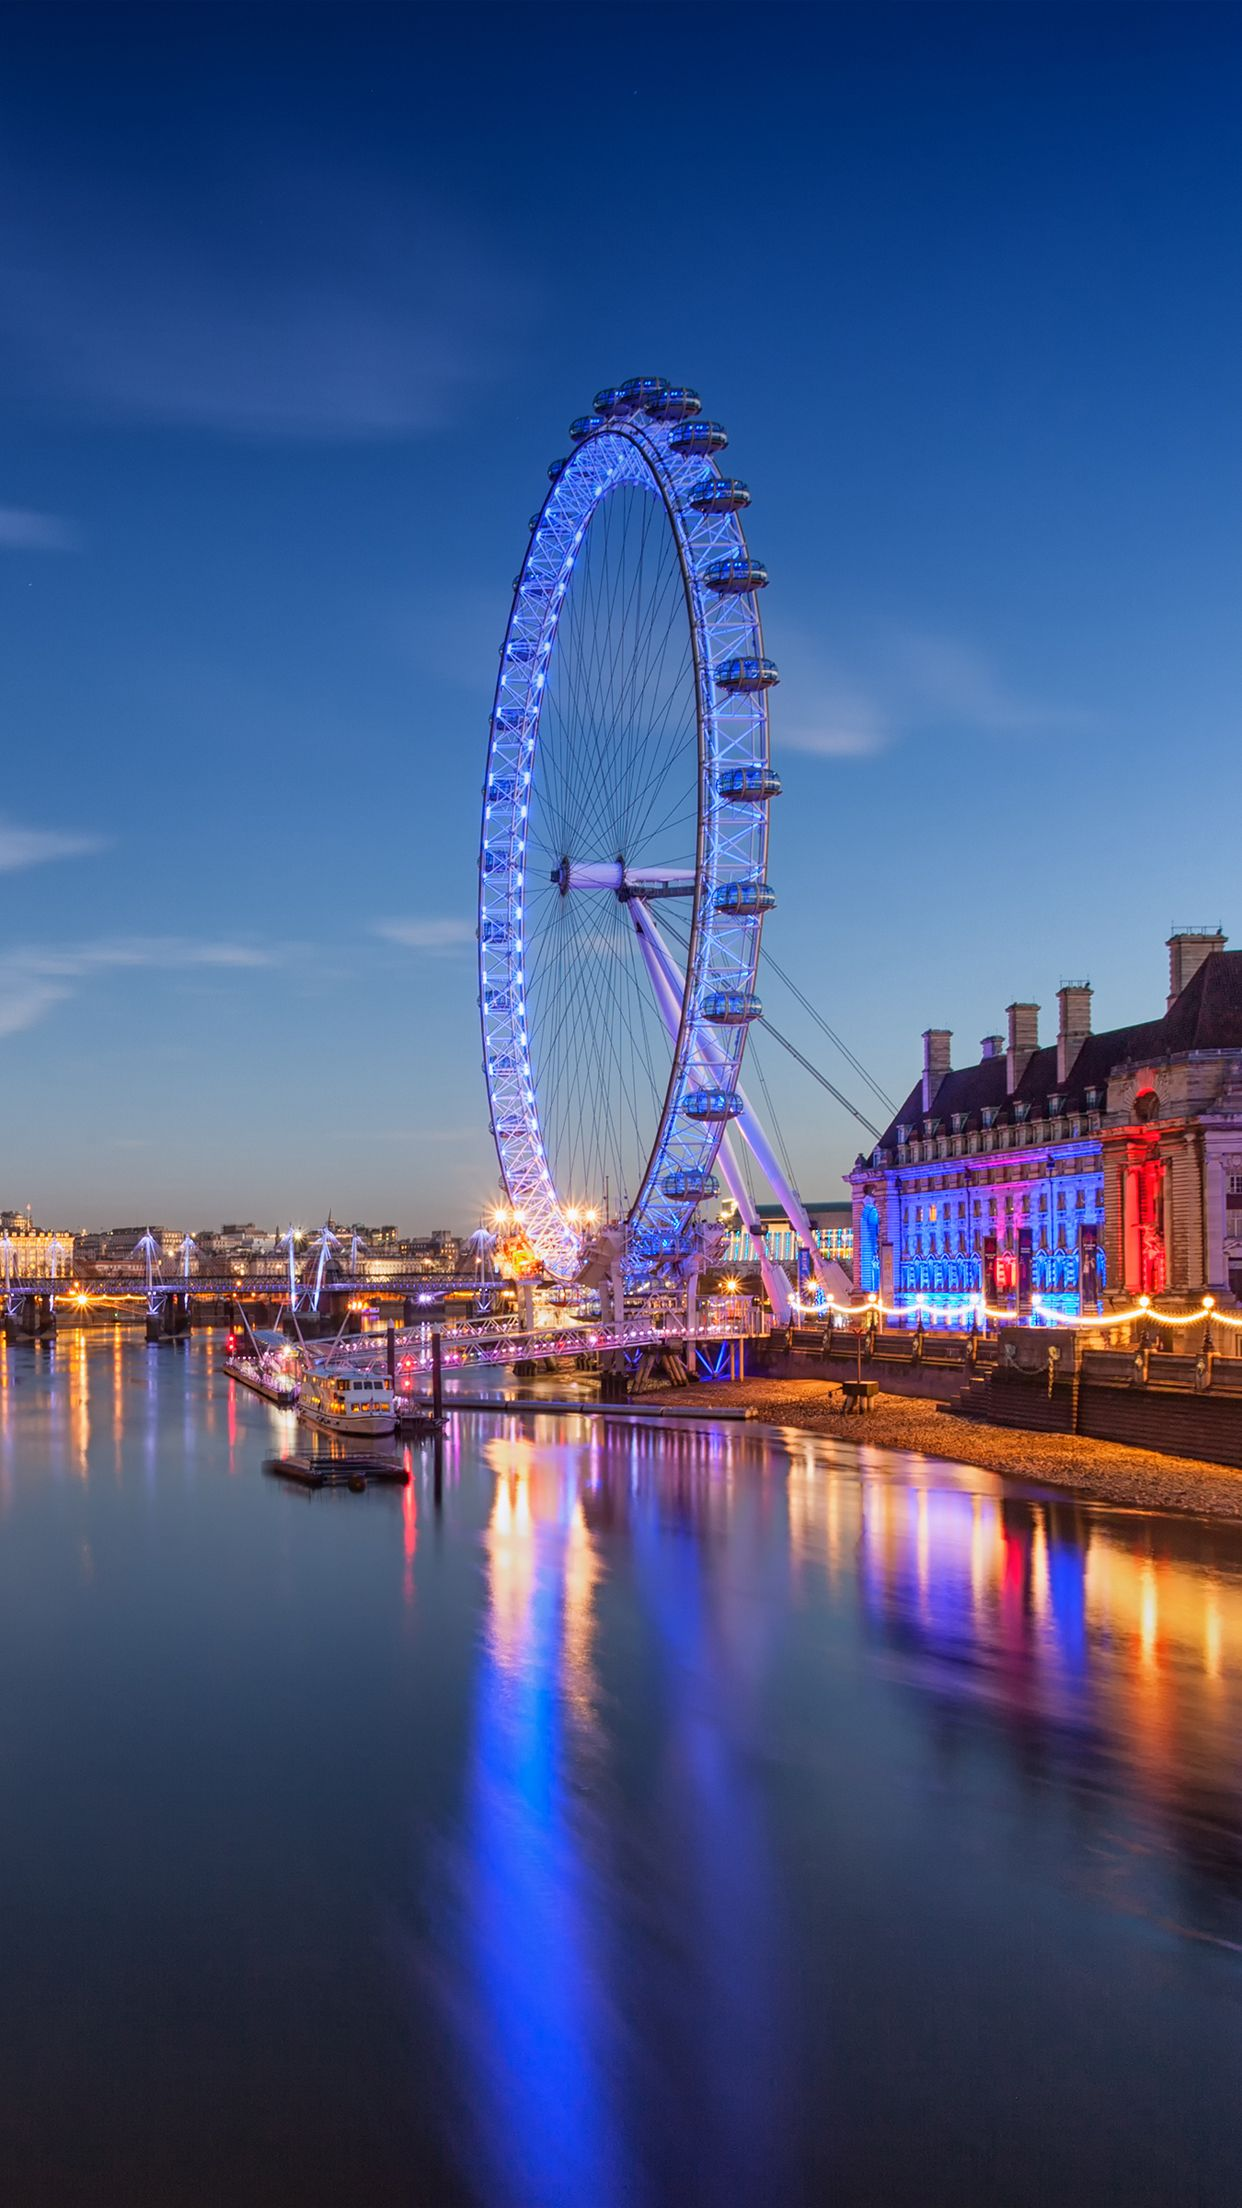 www.3wallpapers.fr wpcontent uploads 2015 08 London